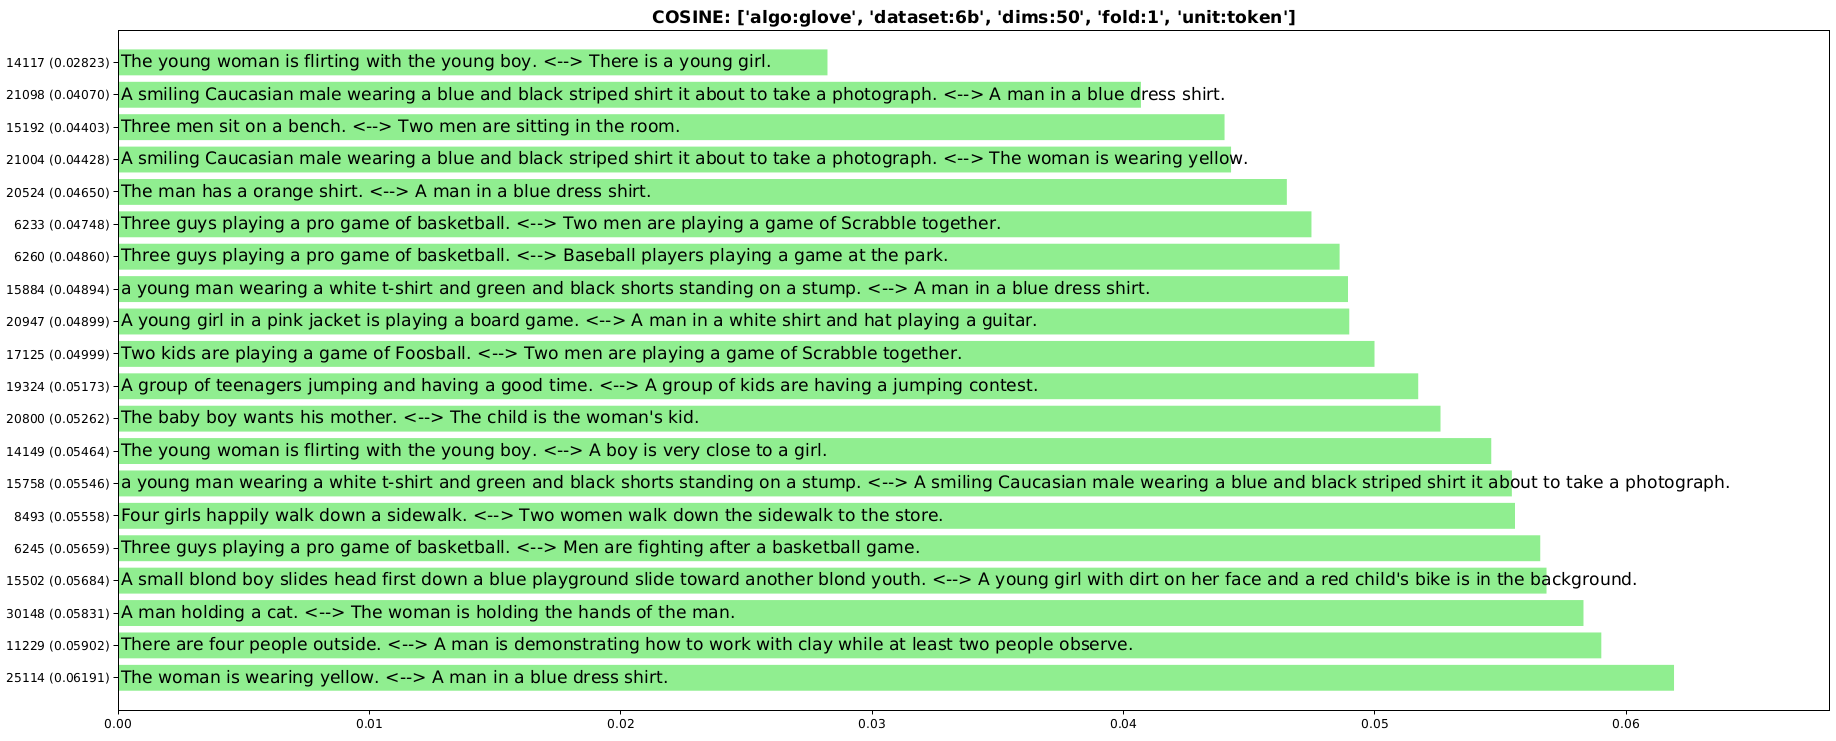 Wombat full list similarity plot